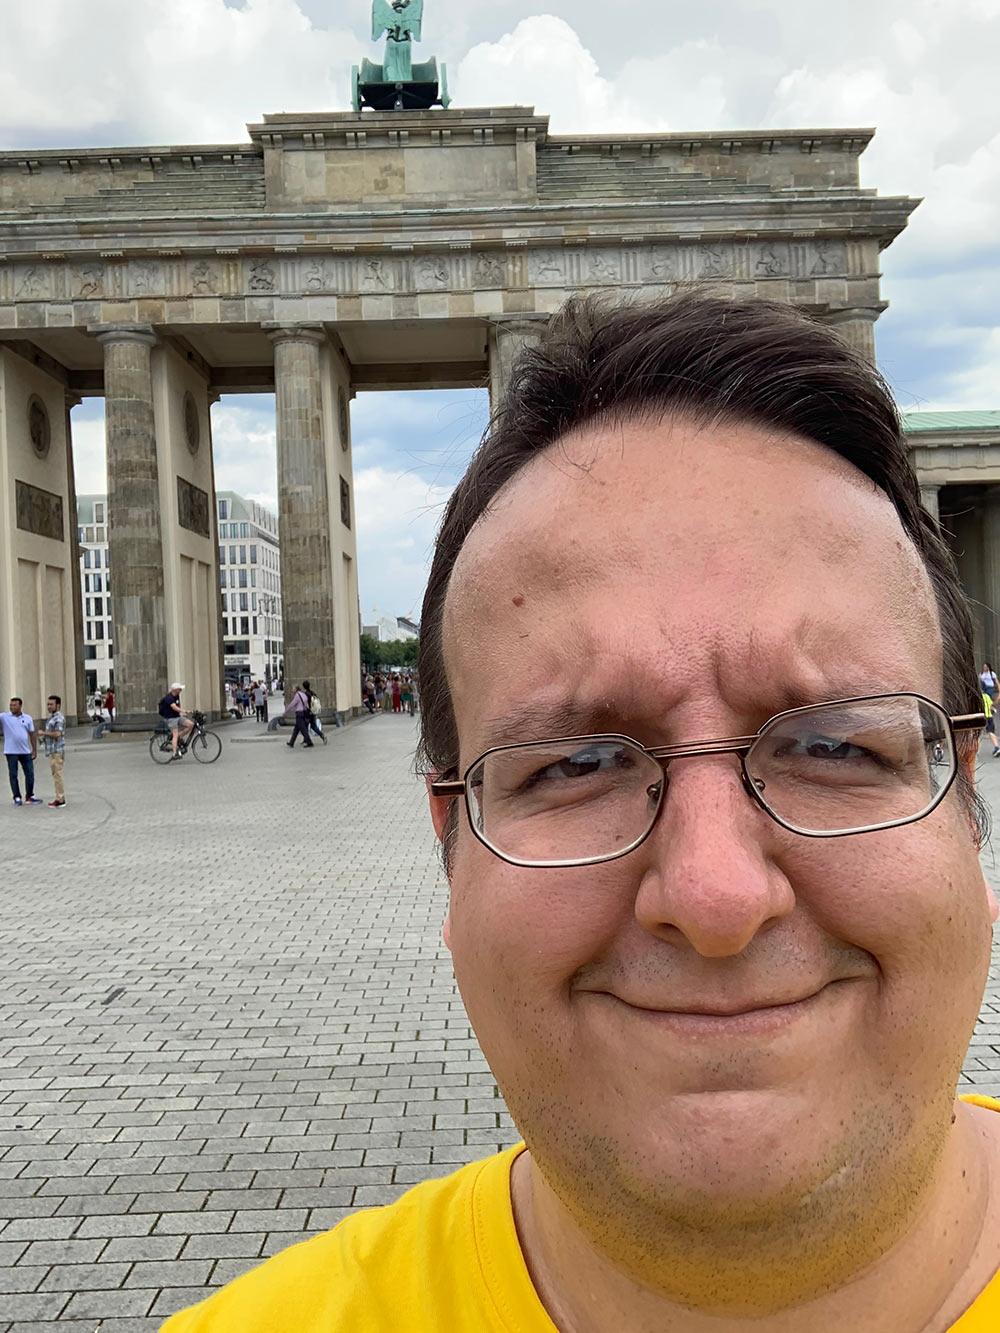 wceu 2019 21 - WordCamp Europe 2019 in Berlin - Tag 1 meines #InfluencerReisli